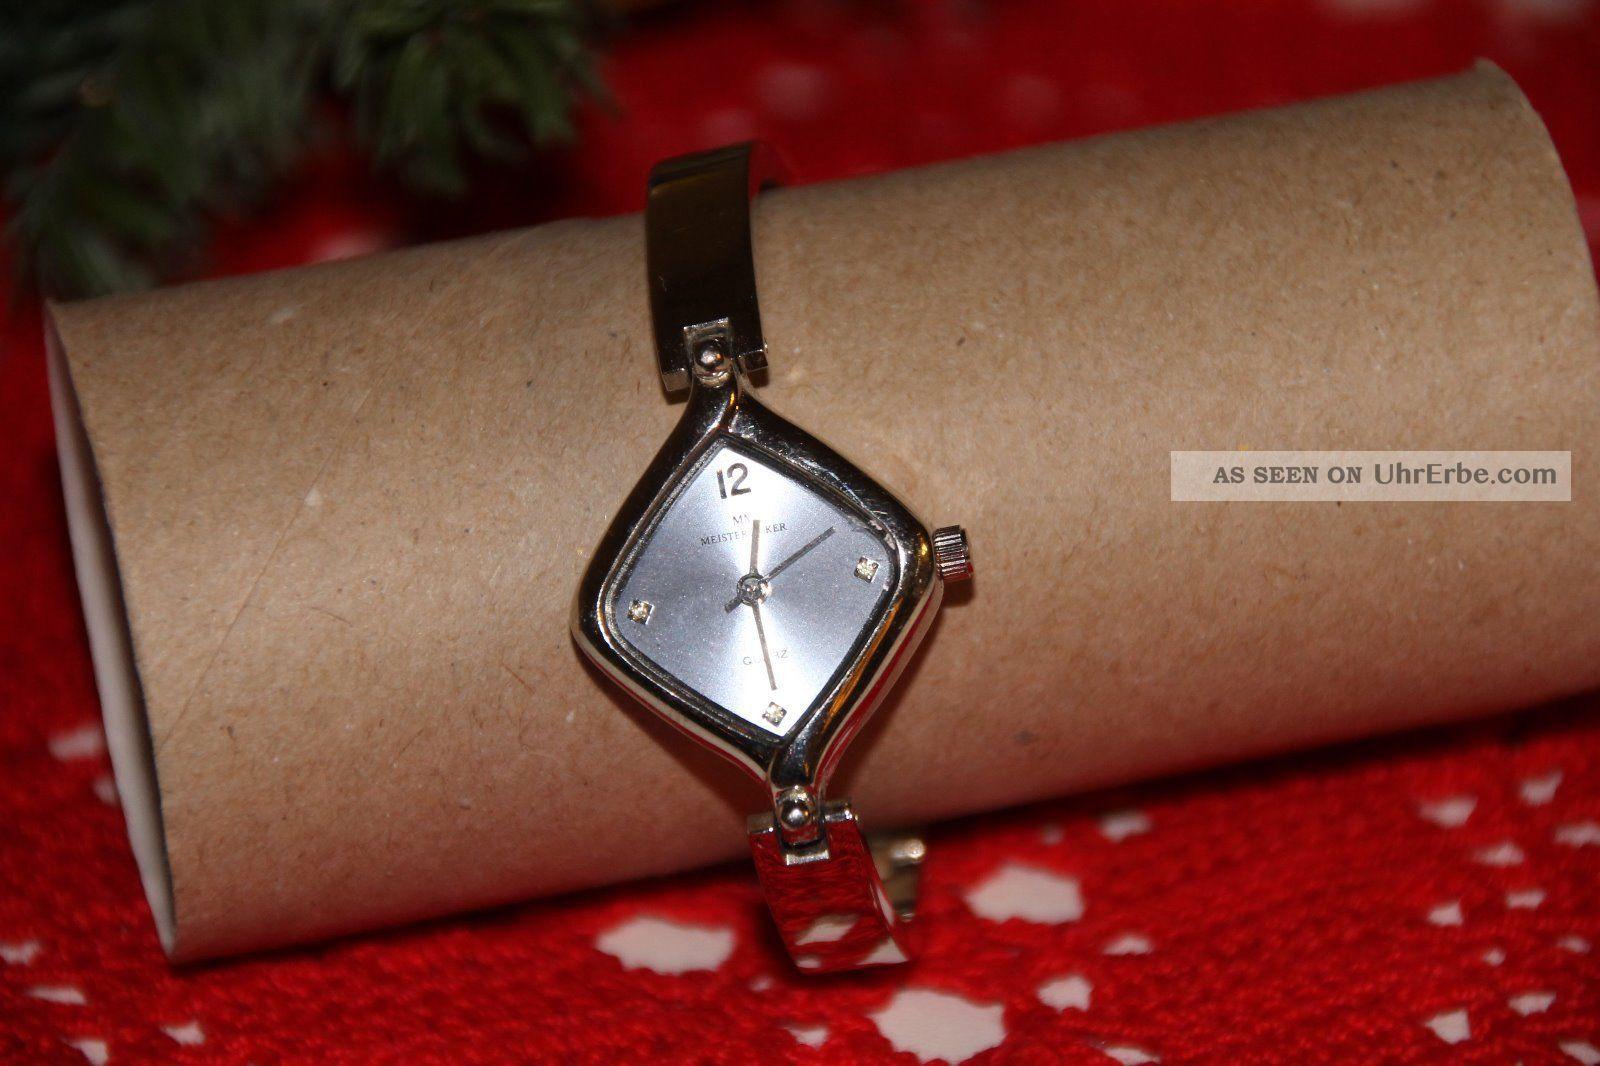 meister anker damen armband uhr silber hellblaues ziffernblatt. Black Bedroom Furniture Sets. Home Design Ideas